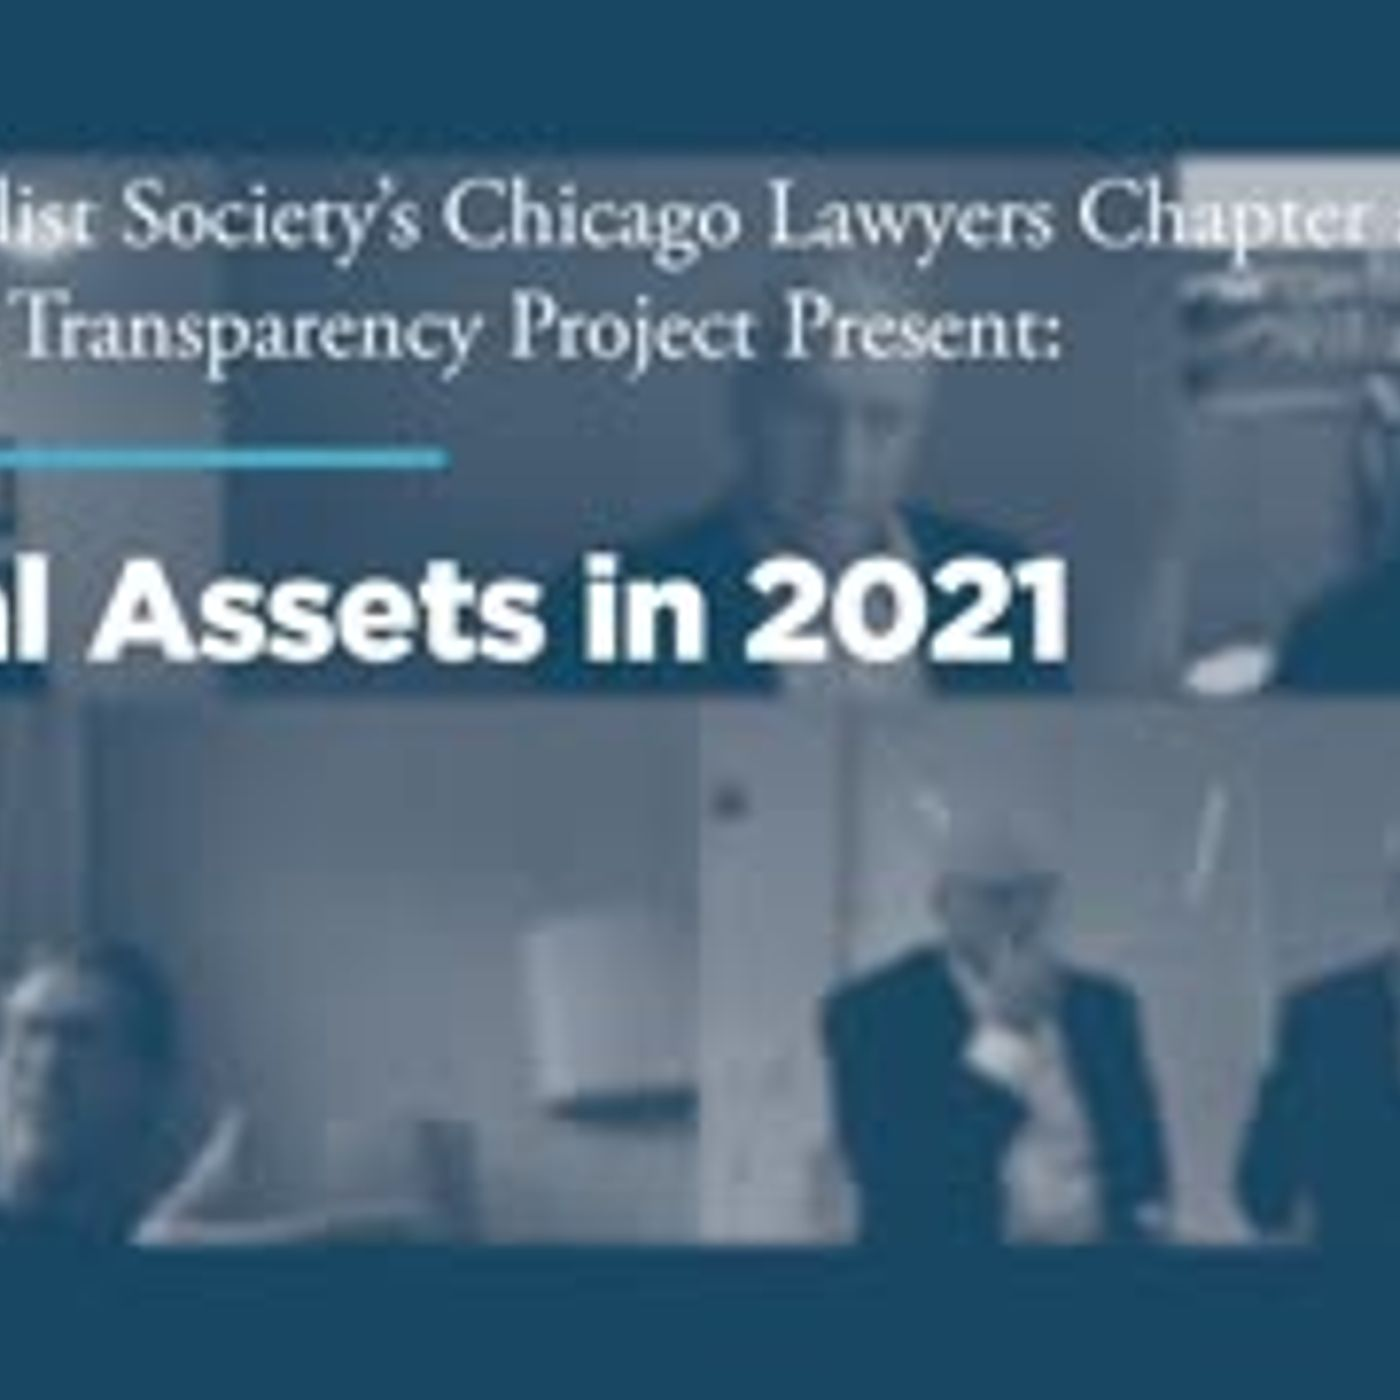 Digital Assets in 2021